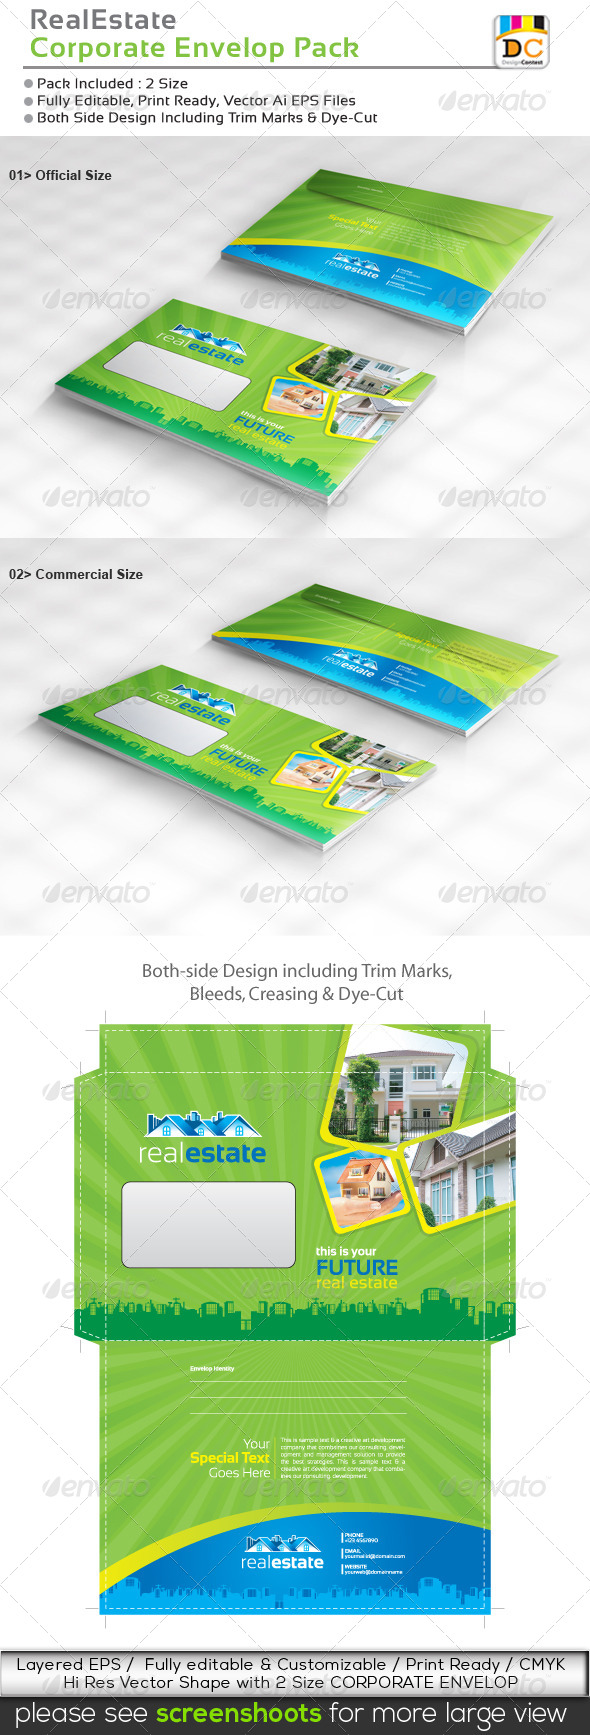 GraphicRiver Real Estate Official Envelop Pack 4862967